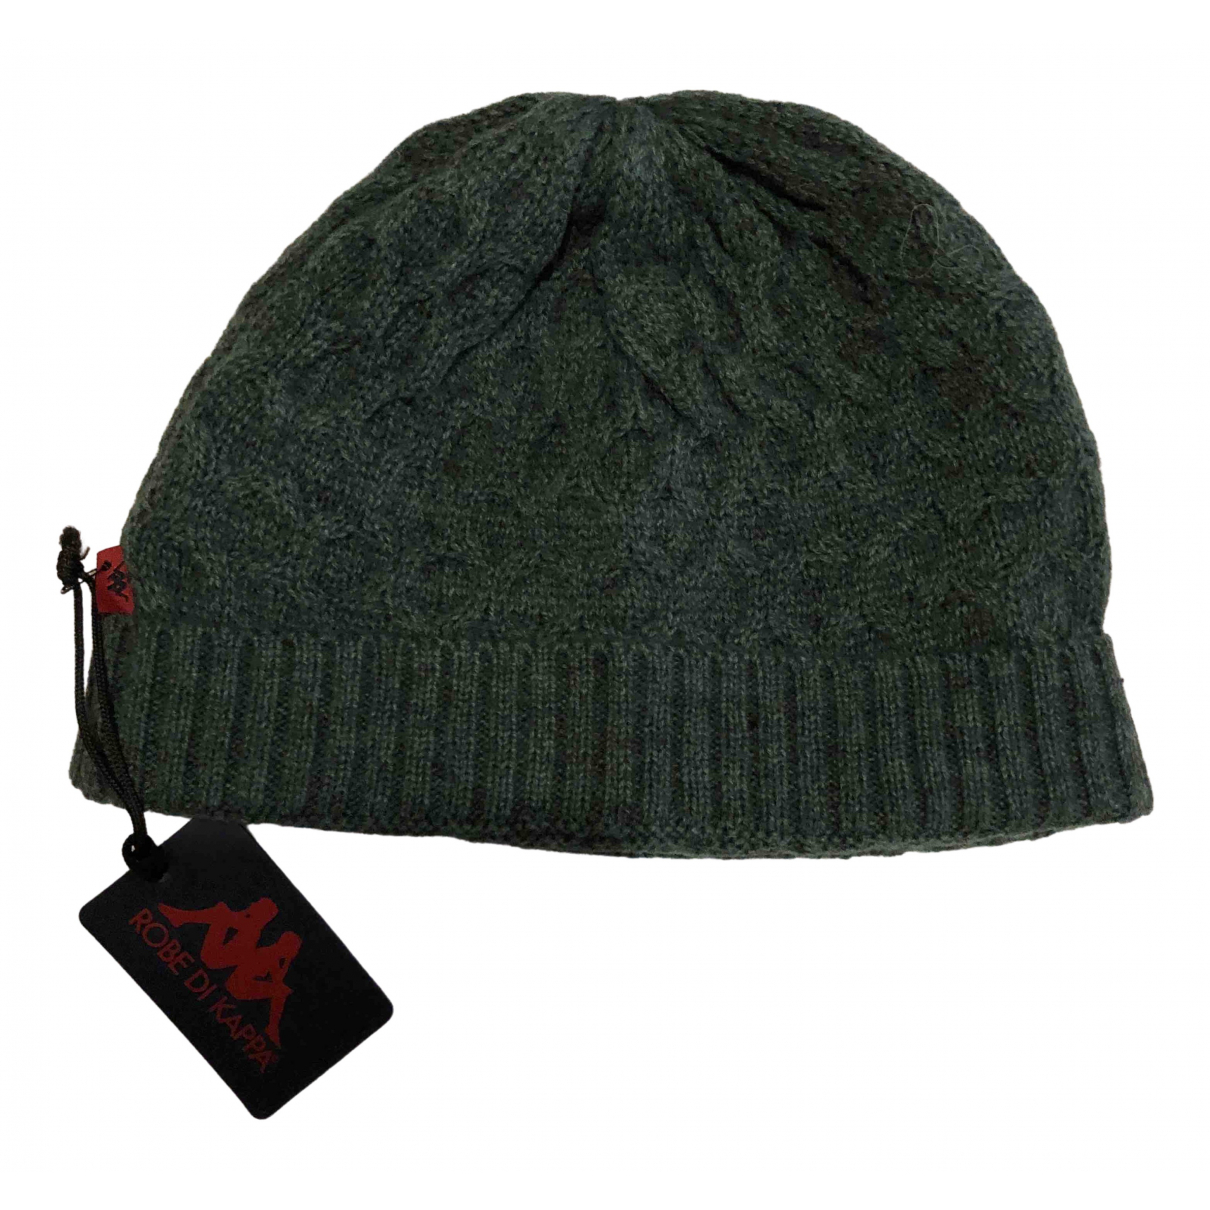 Kappa \N Green hat & pull on hat for Men L International